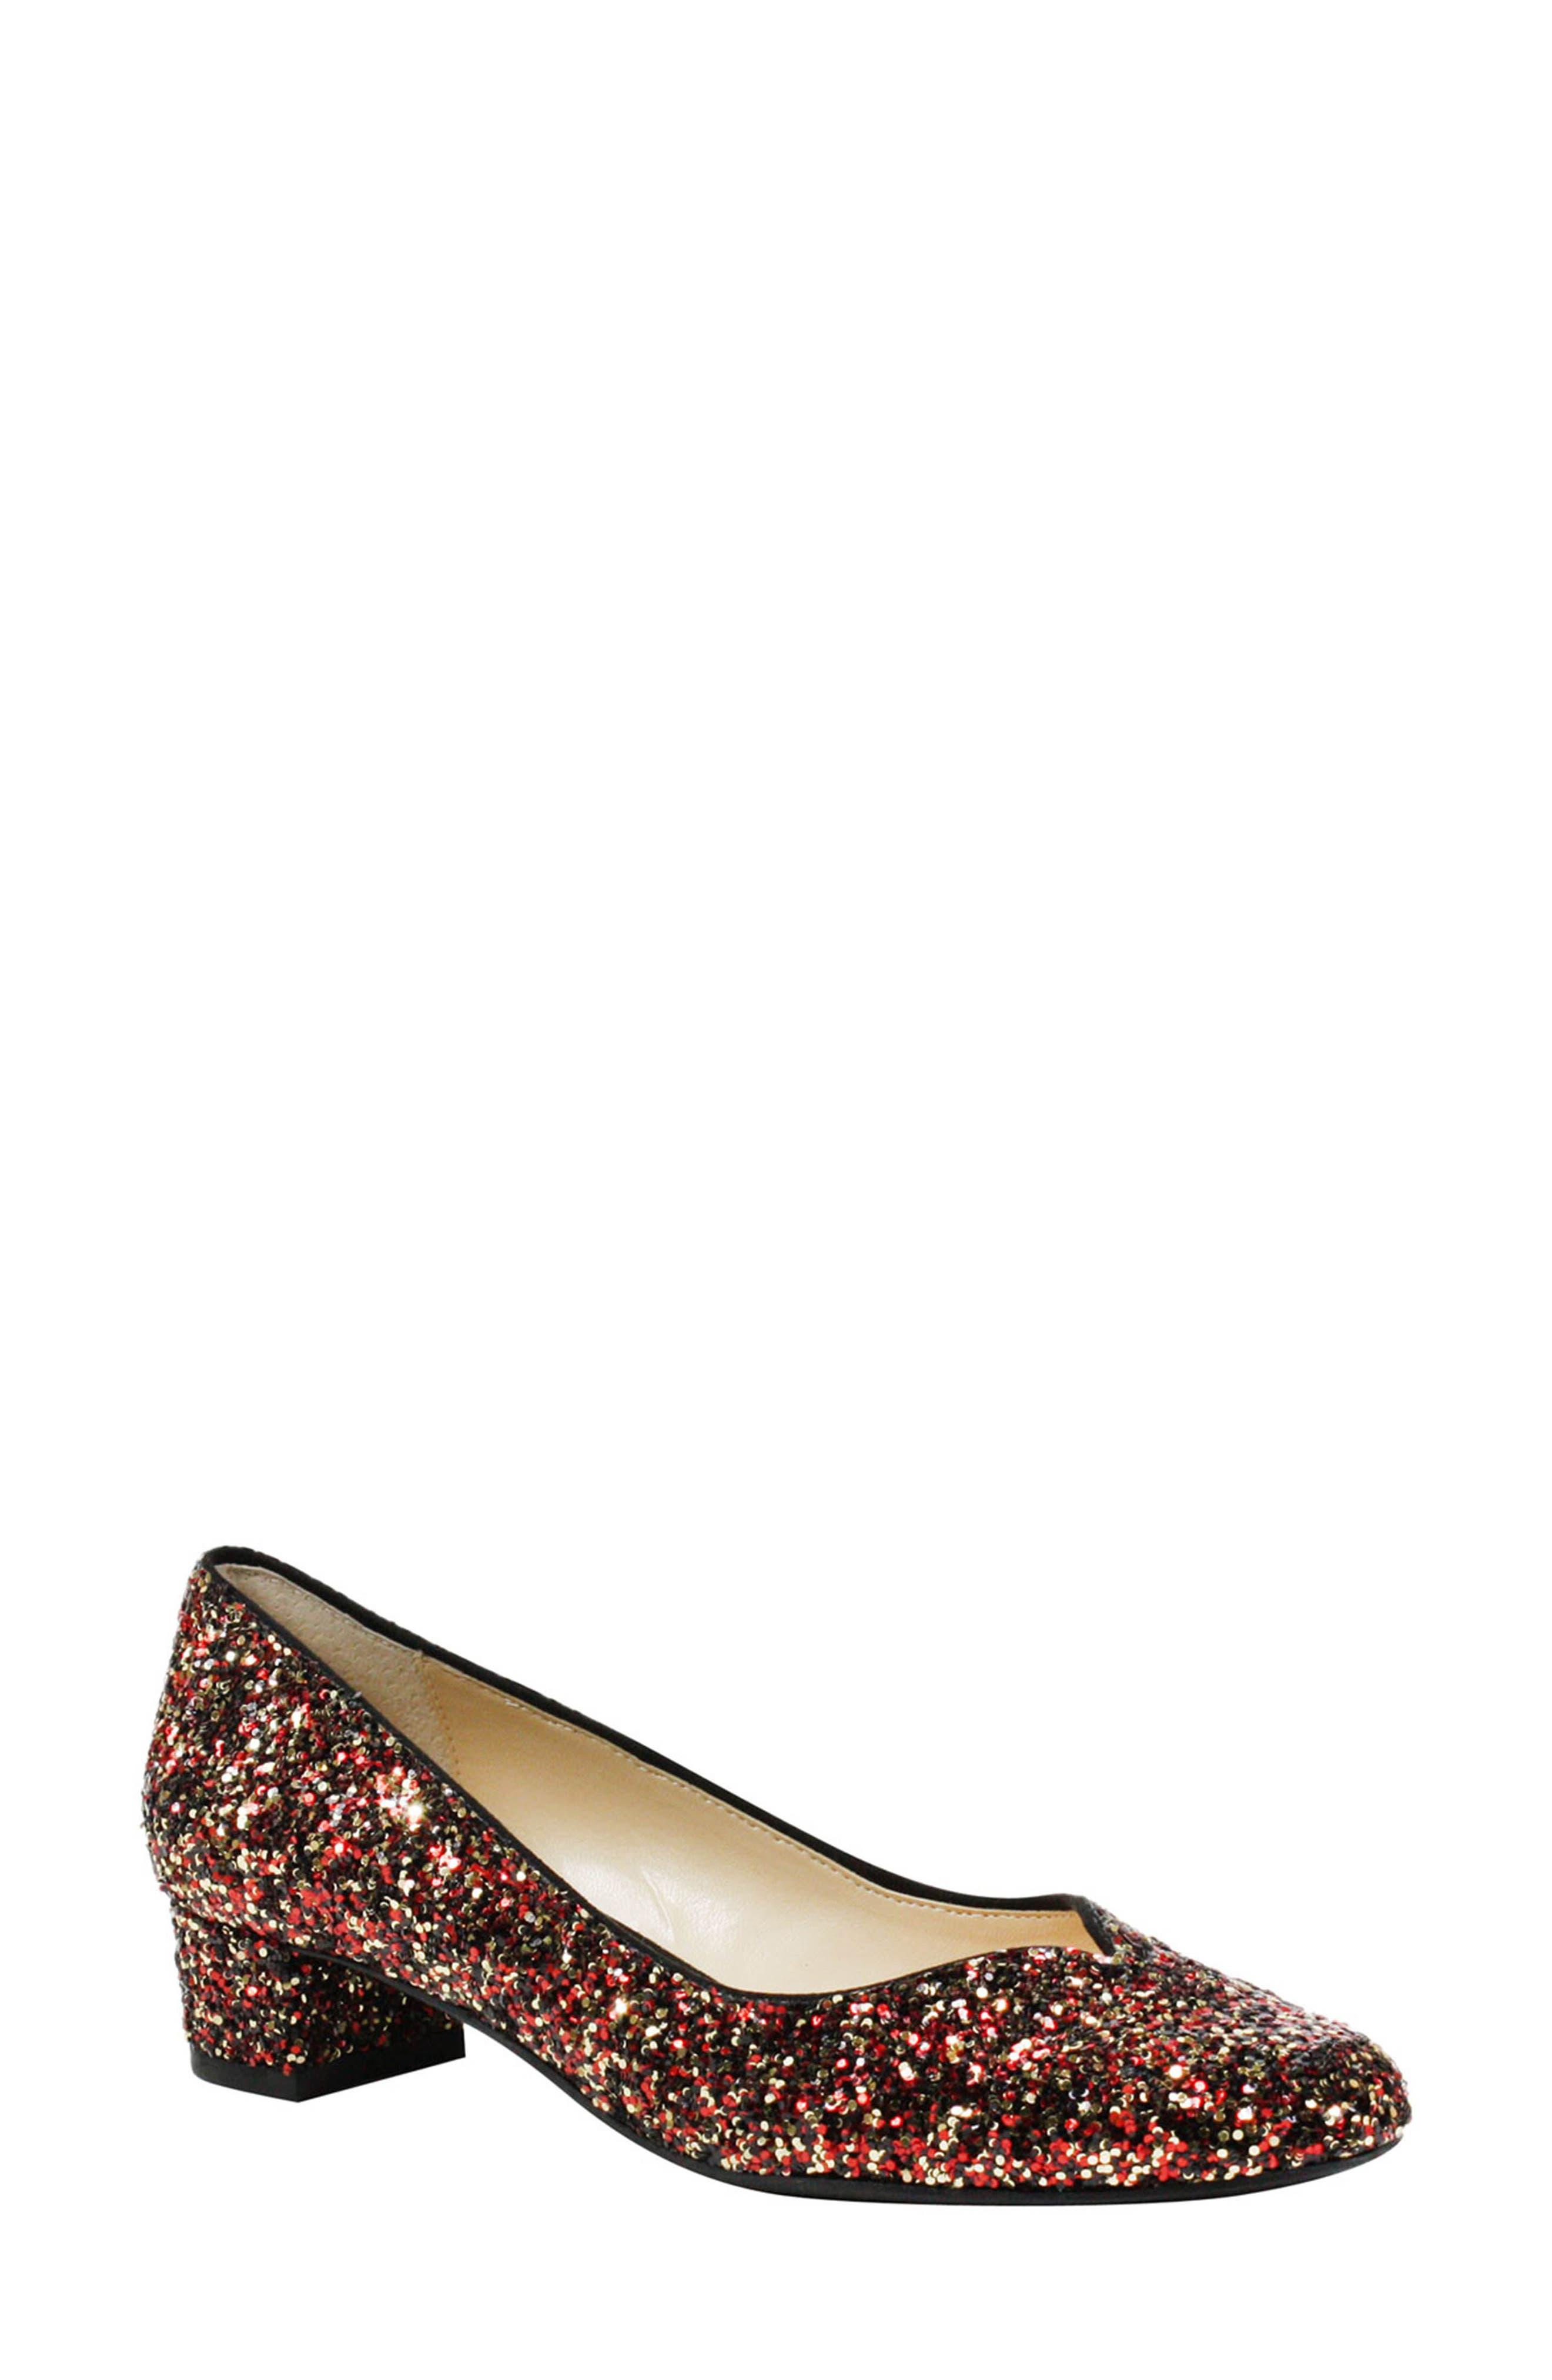 'Bambalina' Block Heel Glitter Pump,                             Main thumbnail 1, color,                             Burgundy Glitter Fabric